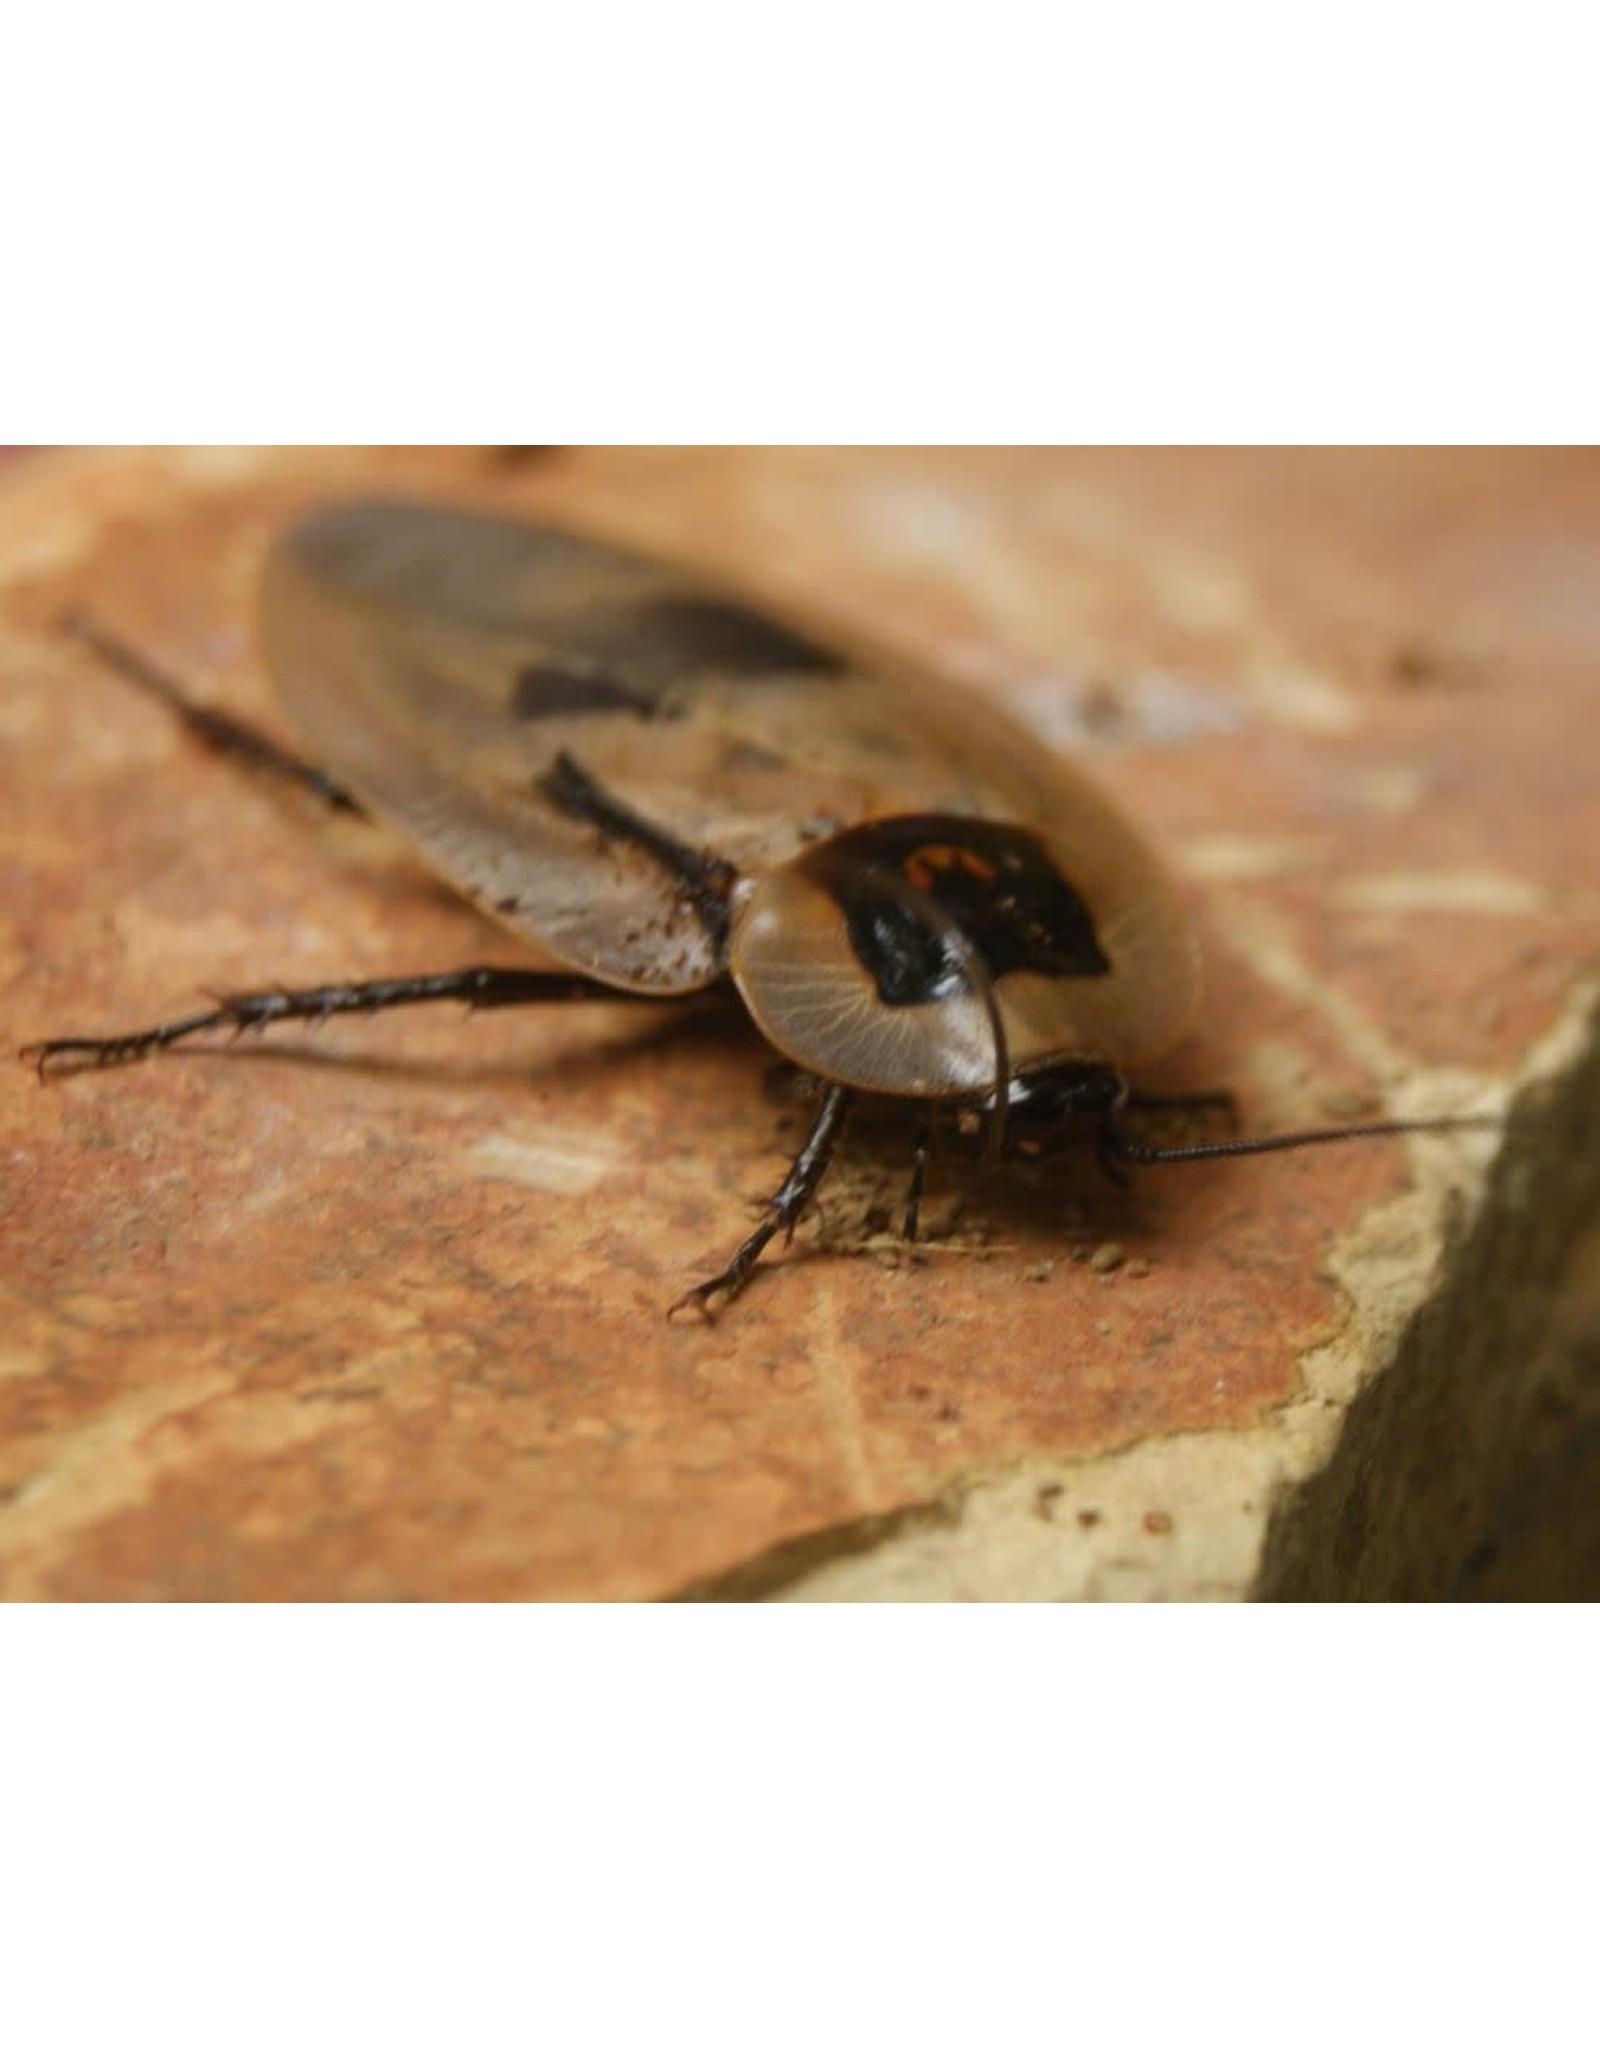 Angell Pets Deaths Head Cockroach (Blaberus craniifer)